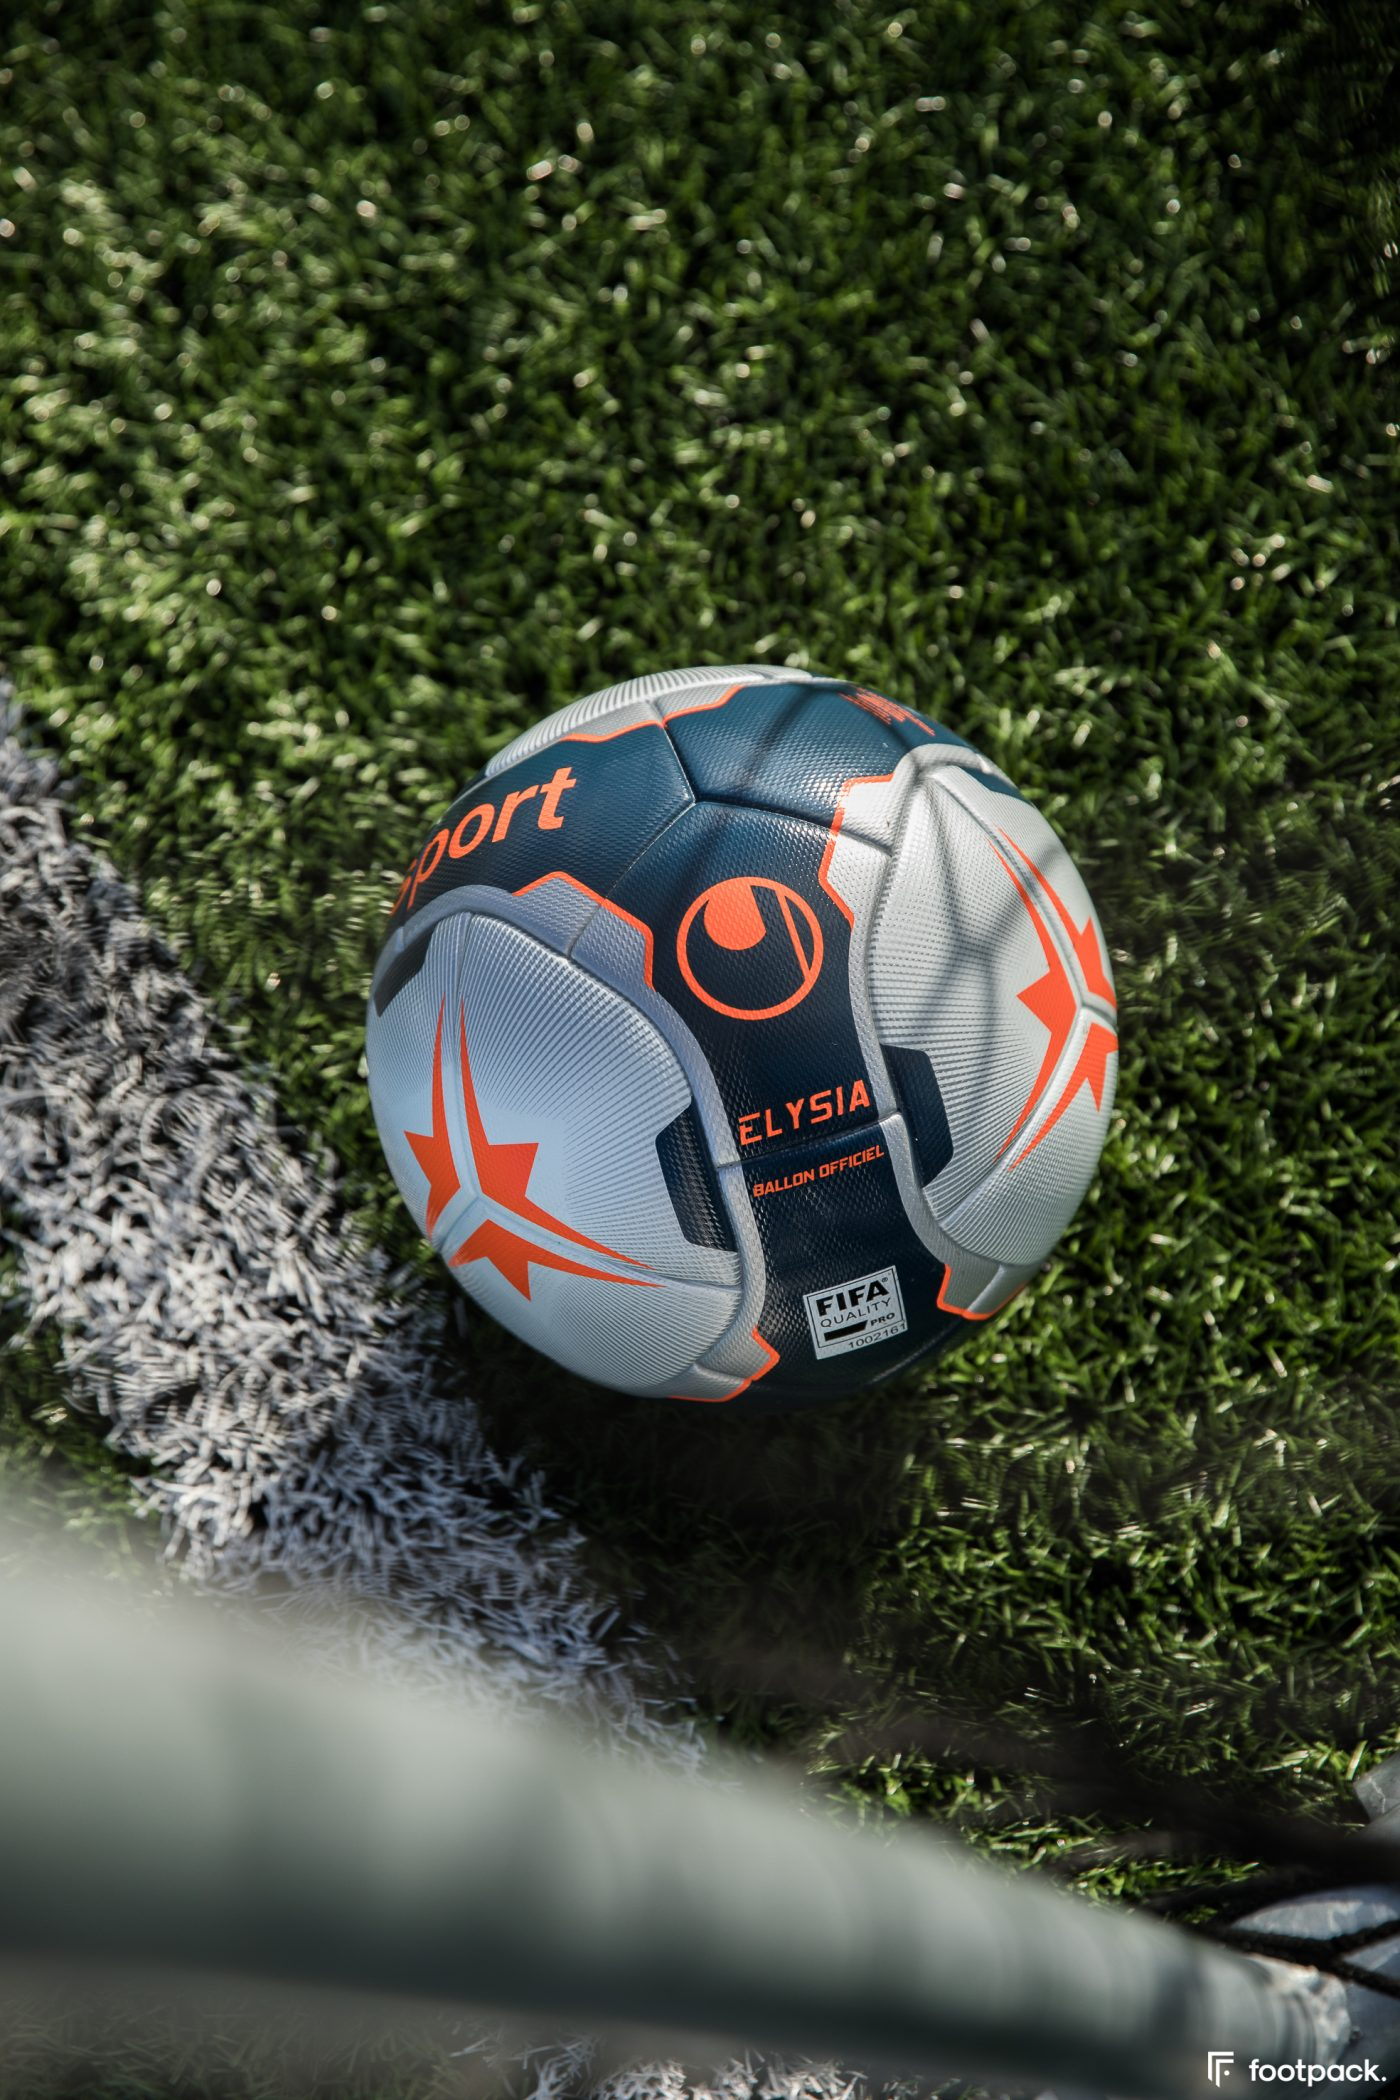 ballon-uhlsport-ligue-1-2020-2021-footpack-1